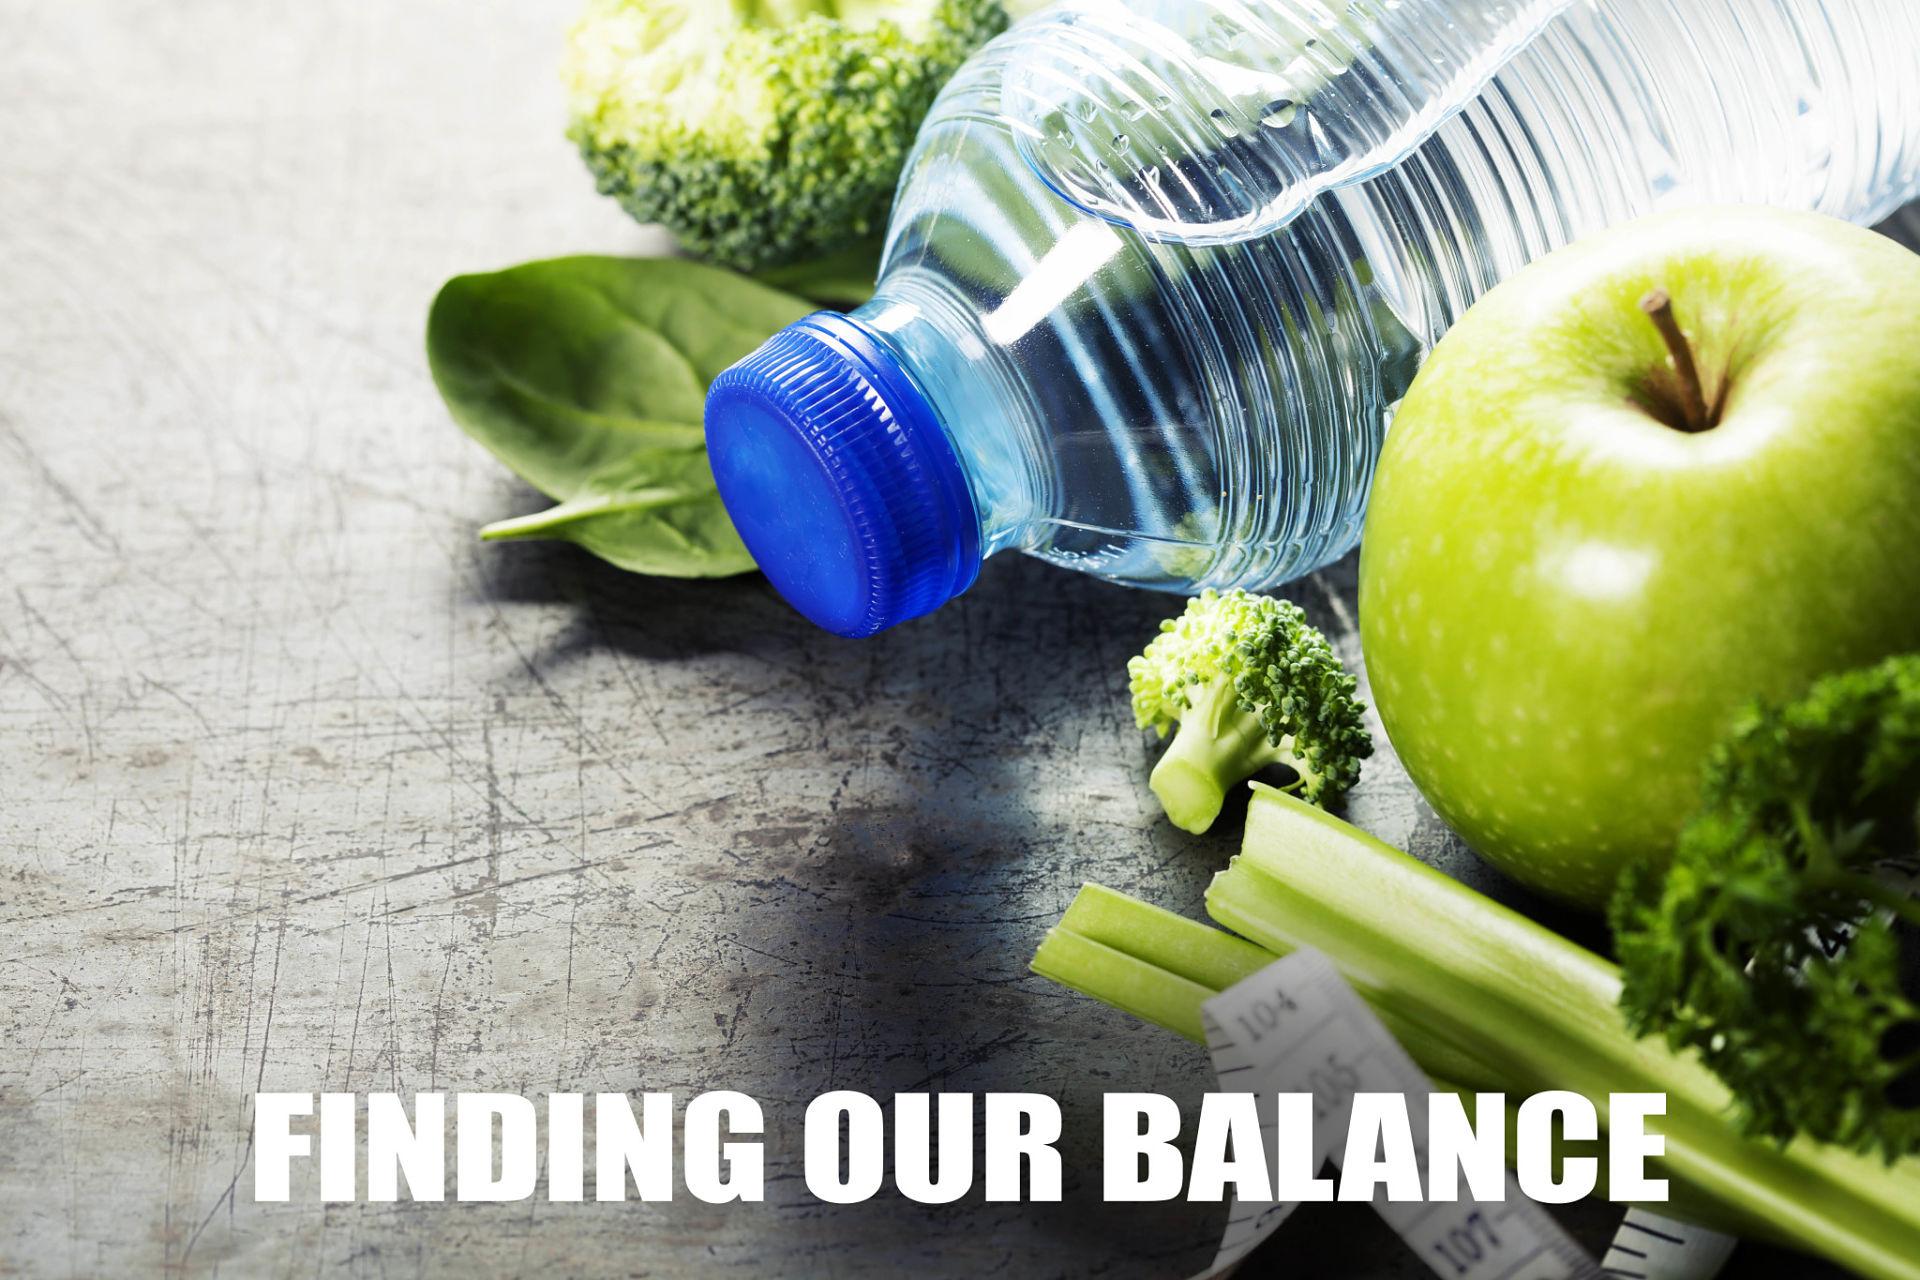 ENCONTRANDO NUESTRO BALANCE/自分の体のバランスを見つけること